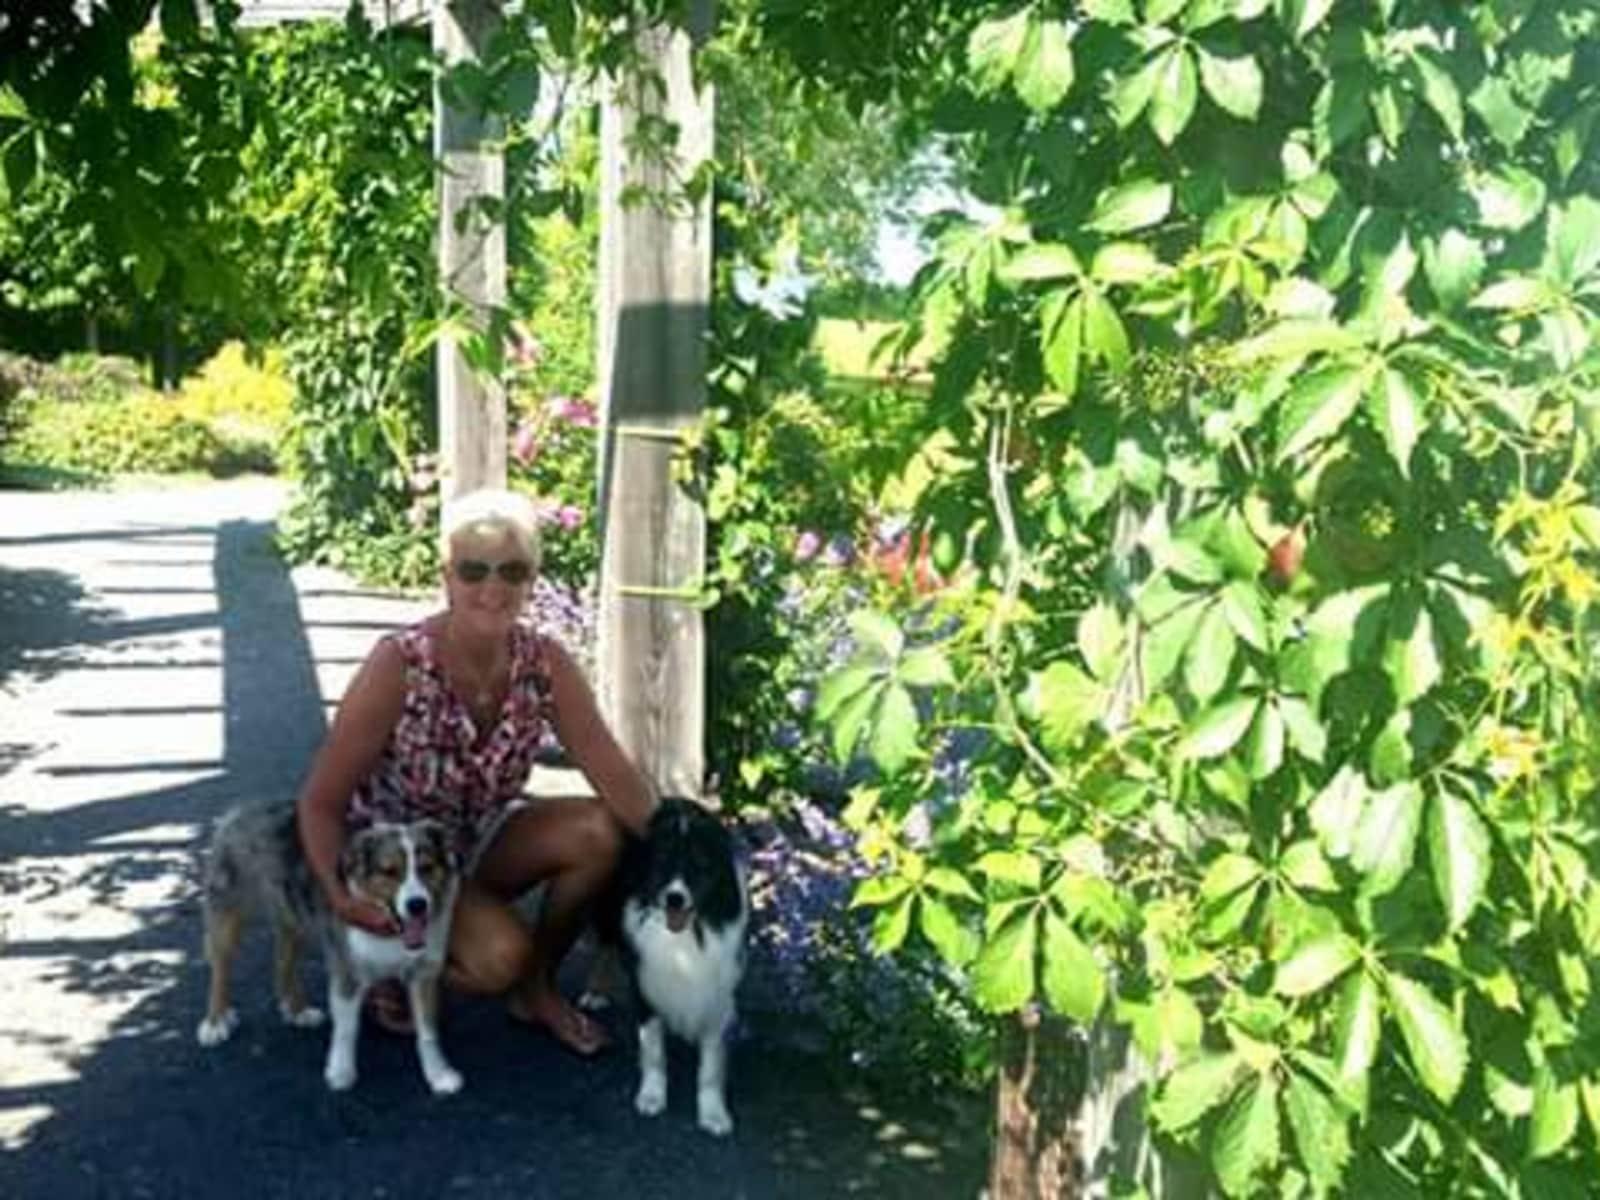 Judy & Evert from Halifax, Nova Scotia, Canada